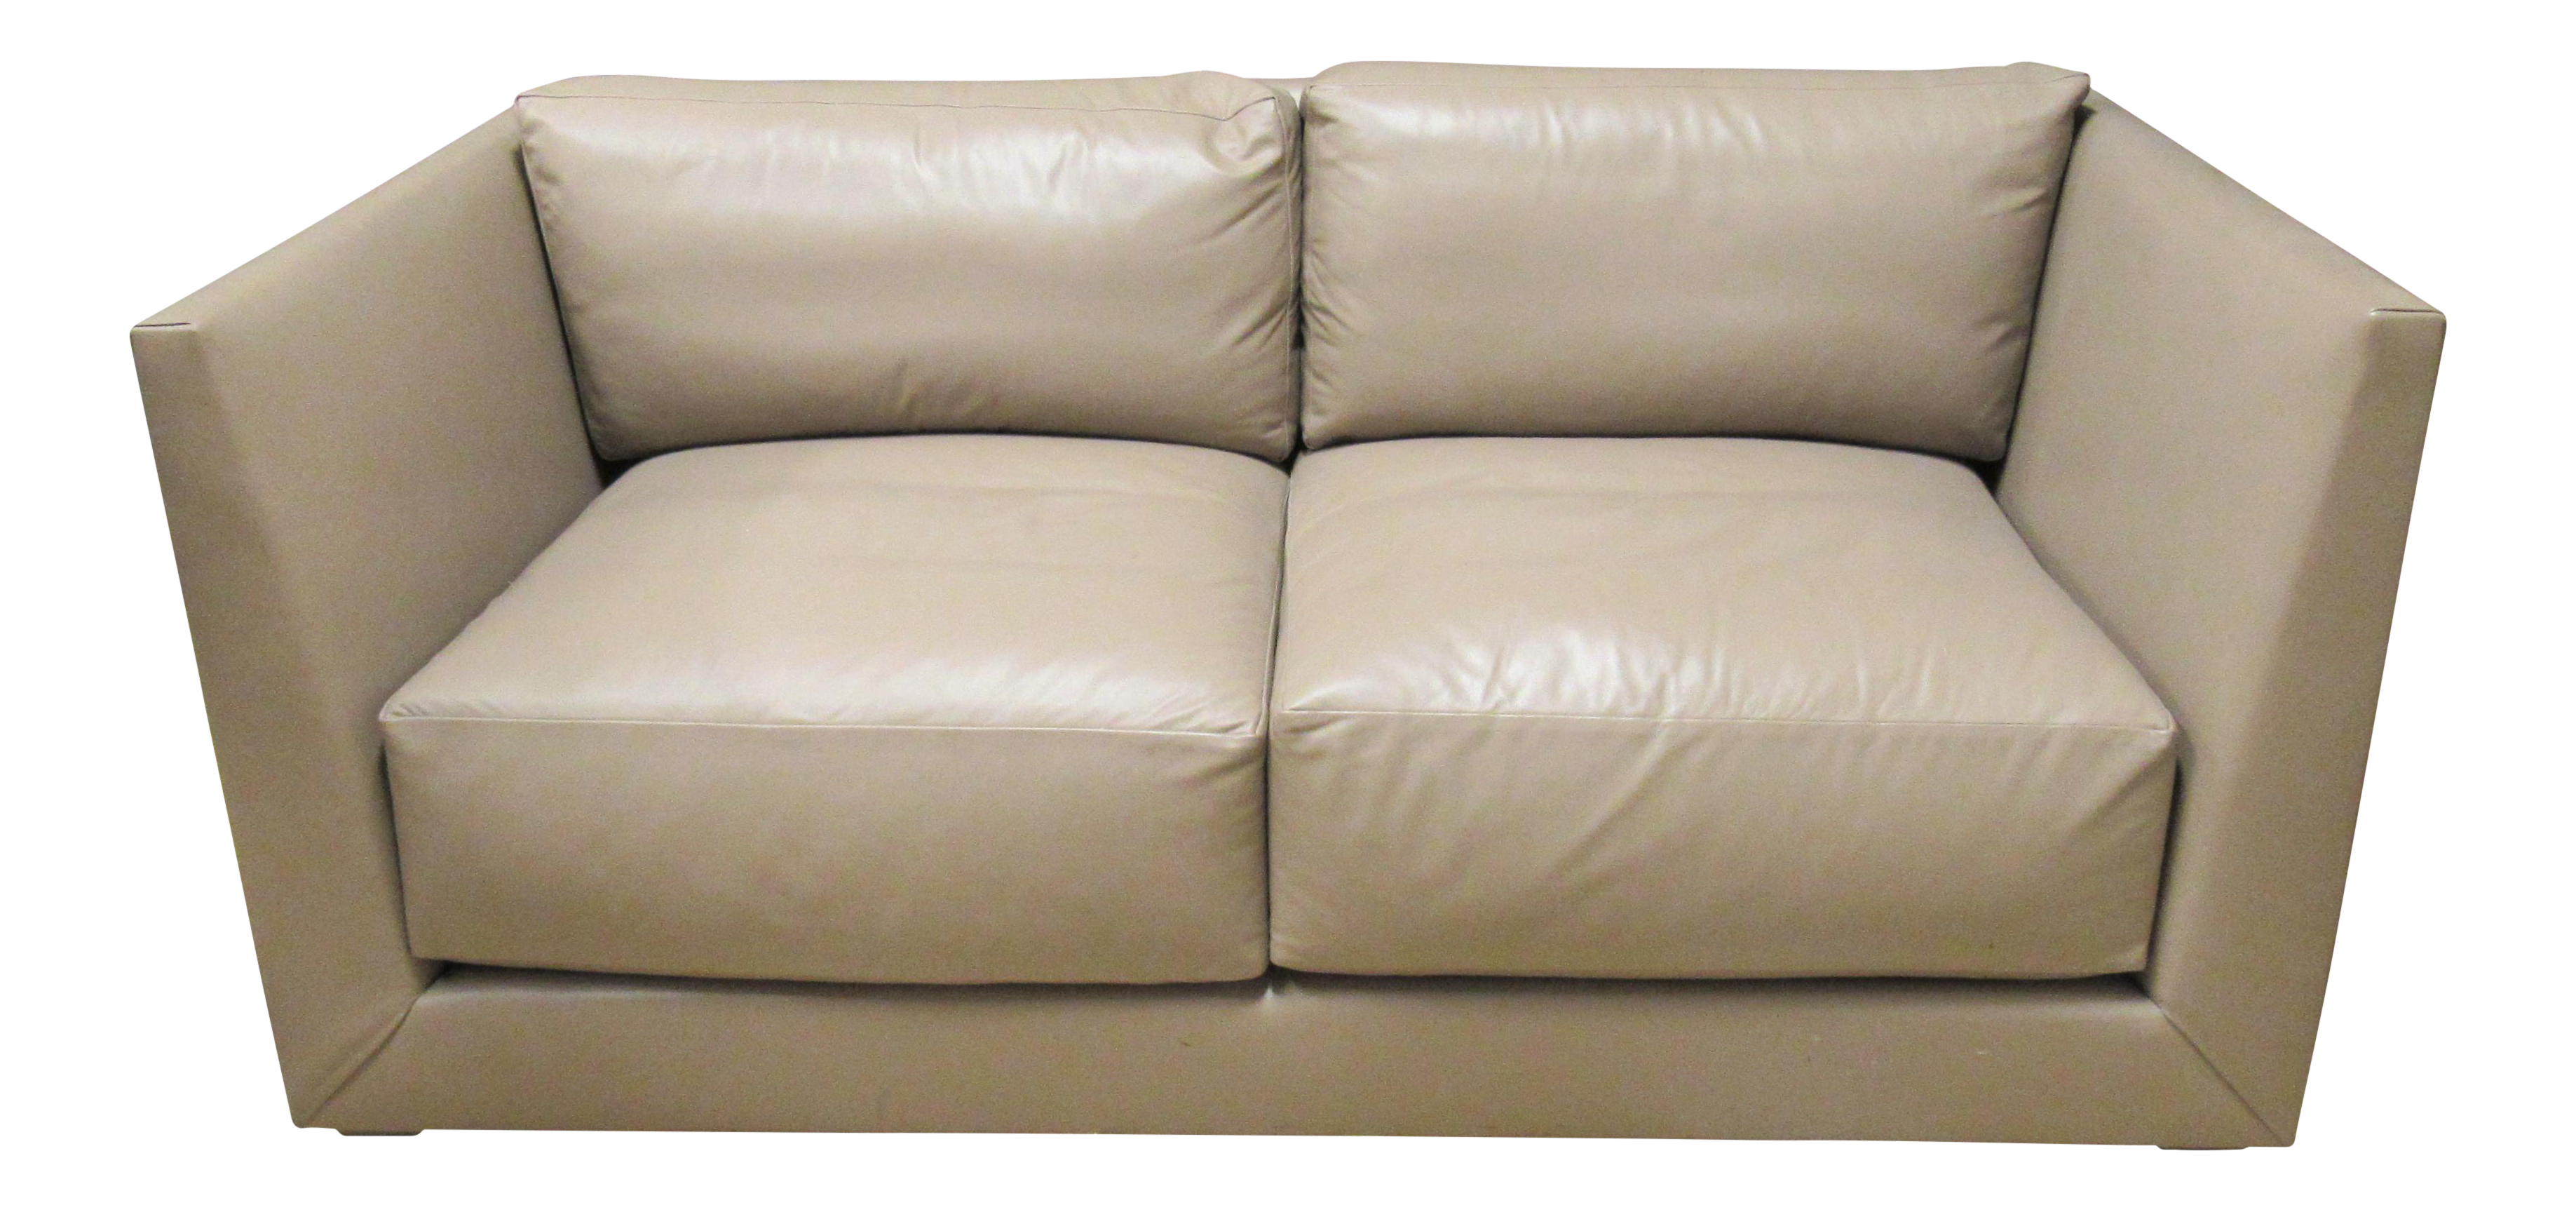 High Quality Donghia Modern Leather Sofa